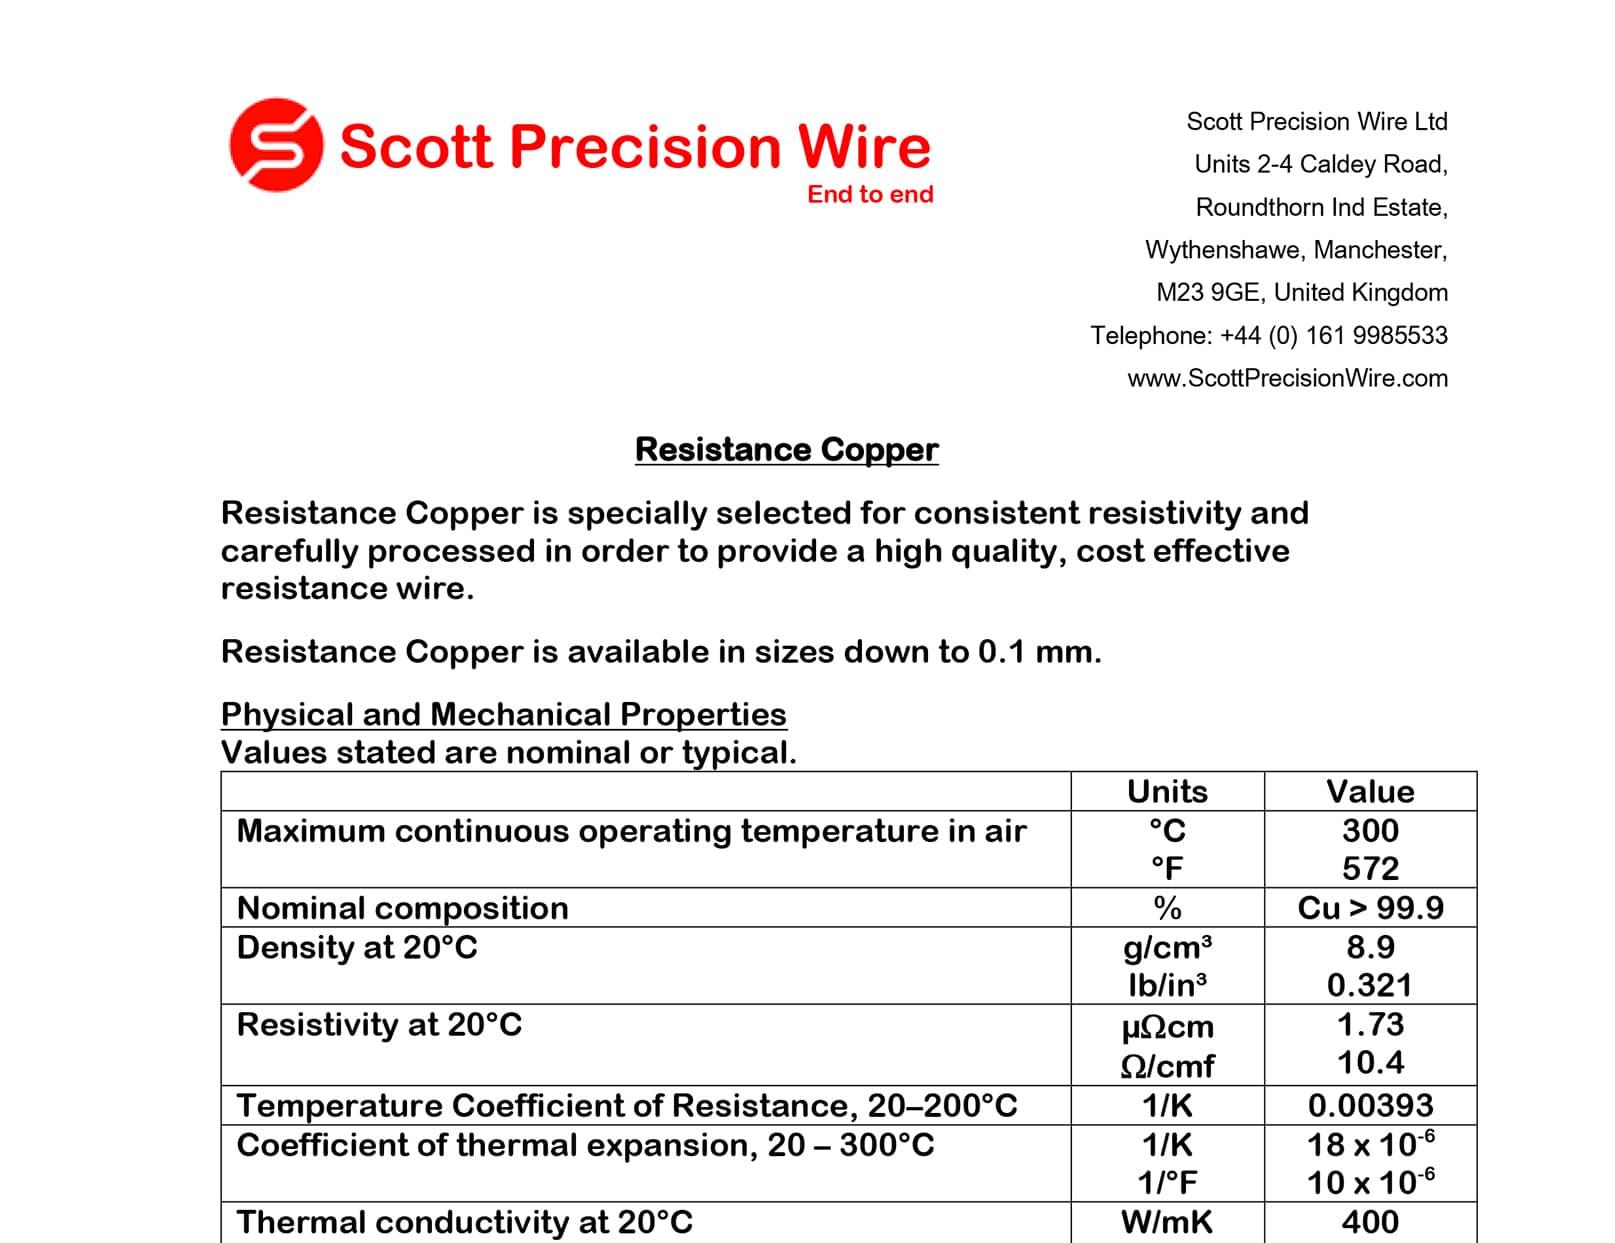 Resistance Copper